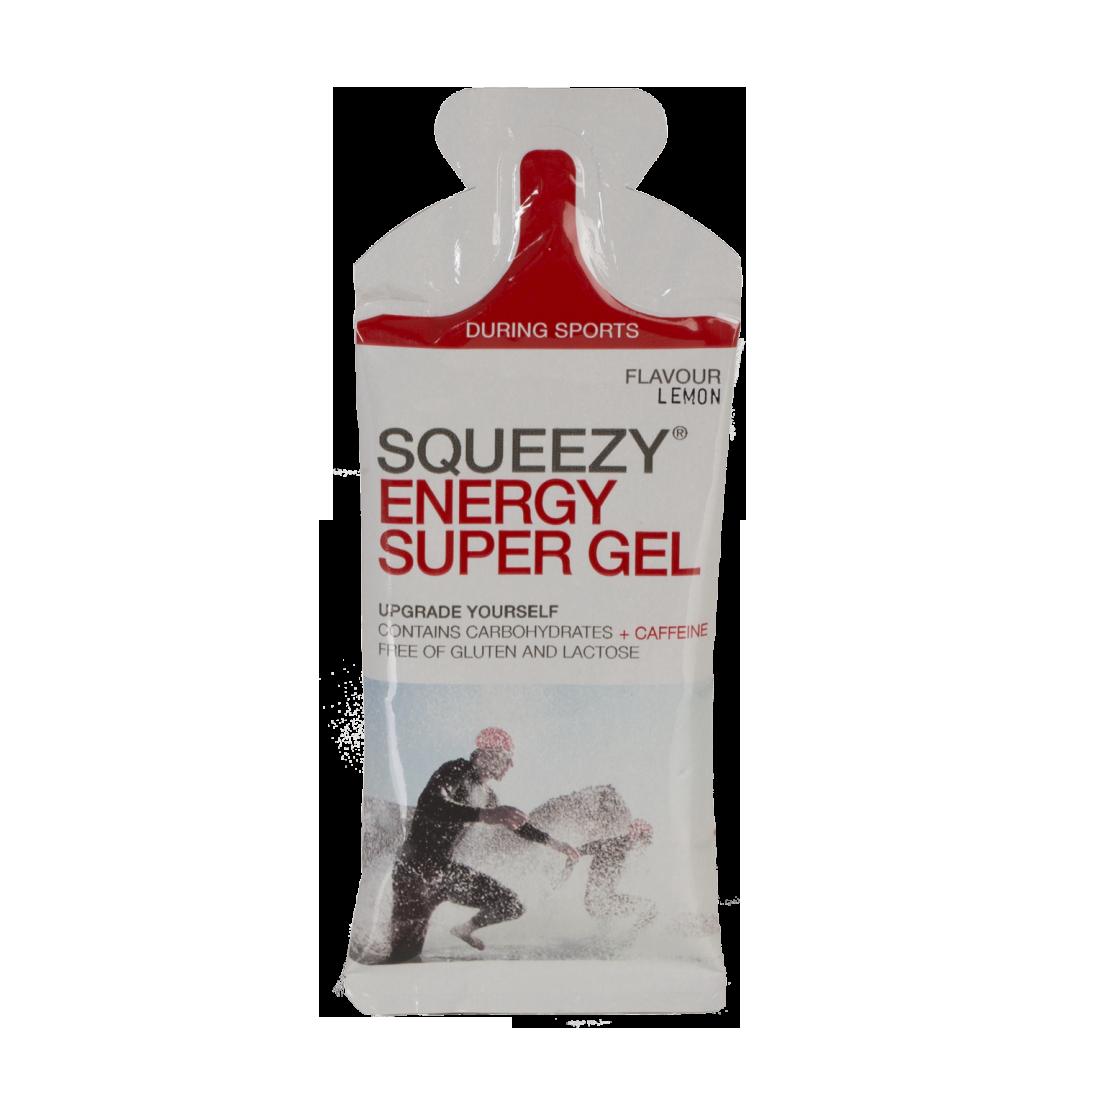 ENERGY SUPER GEL SQUEEZY